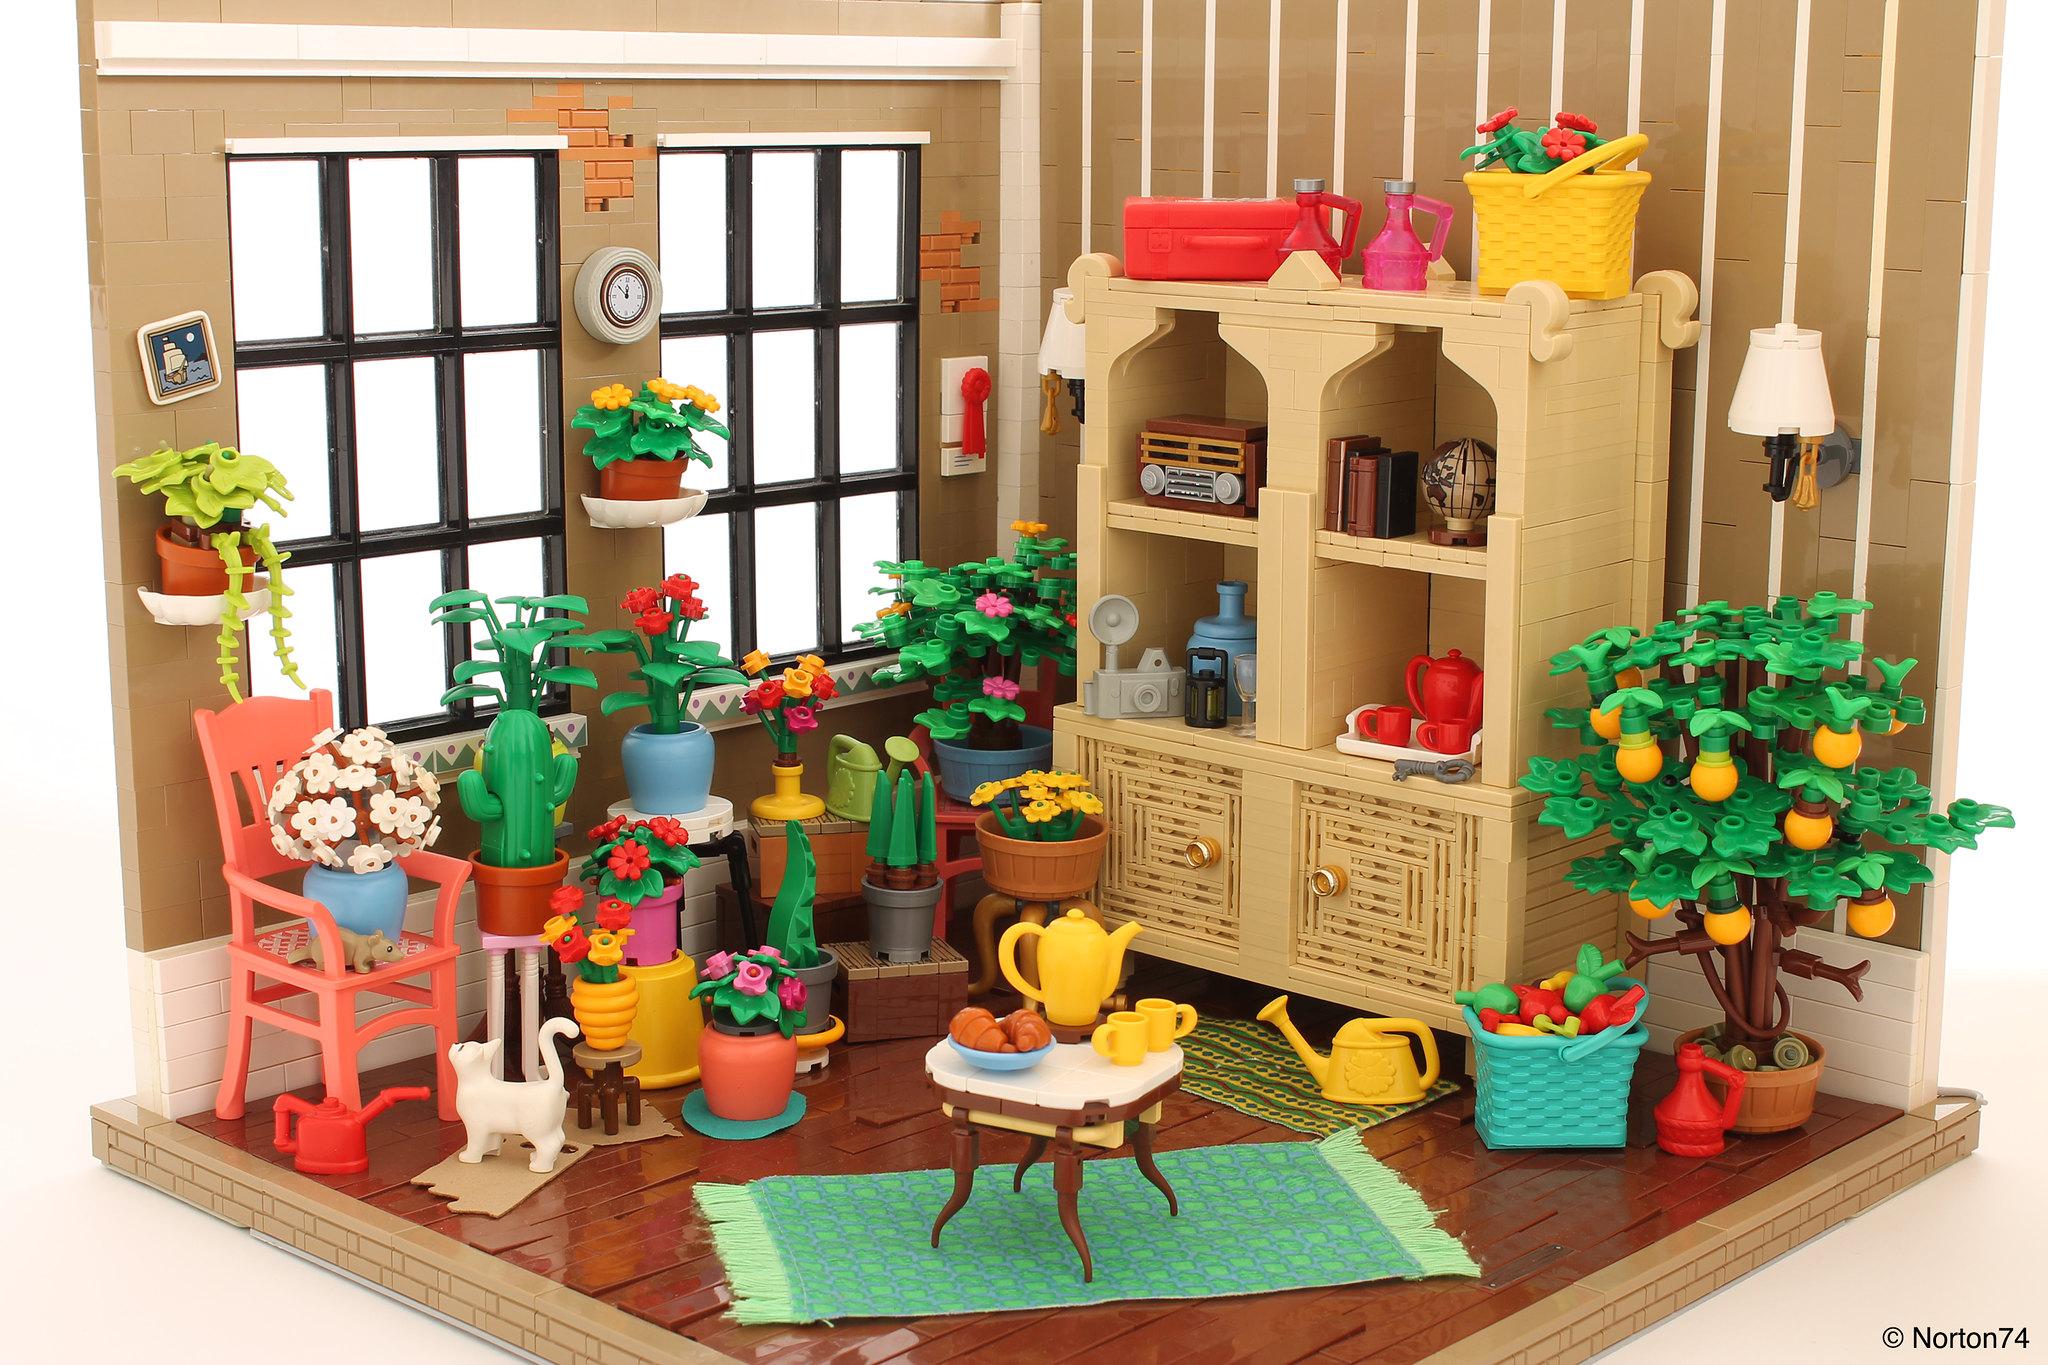 LEGO Jardin d'hiver - Norton74